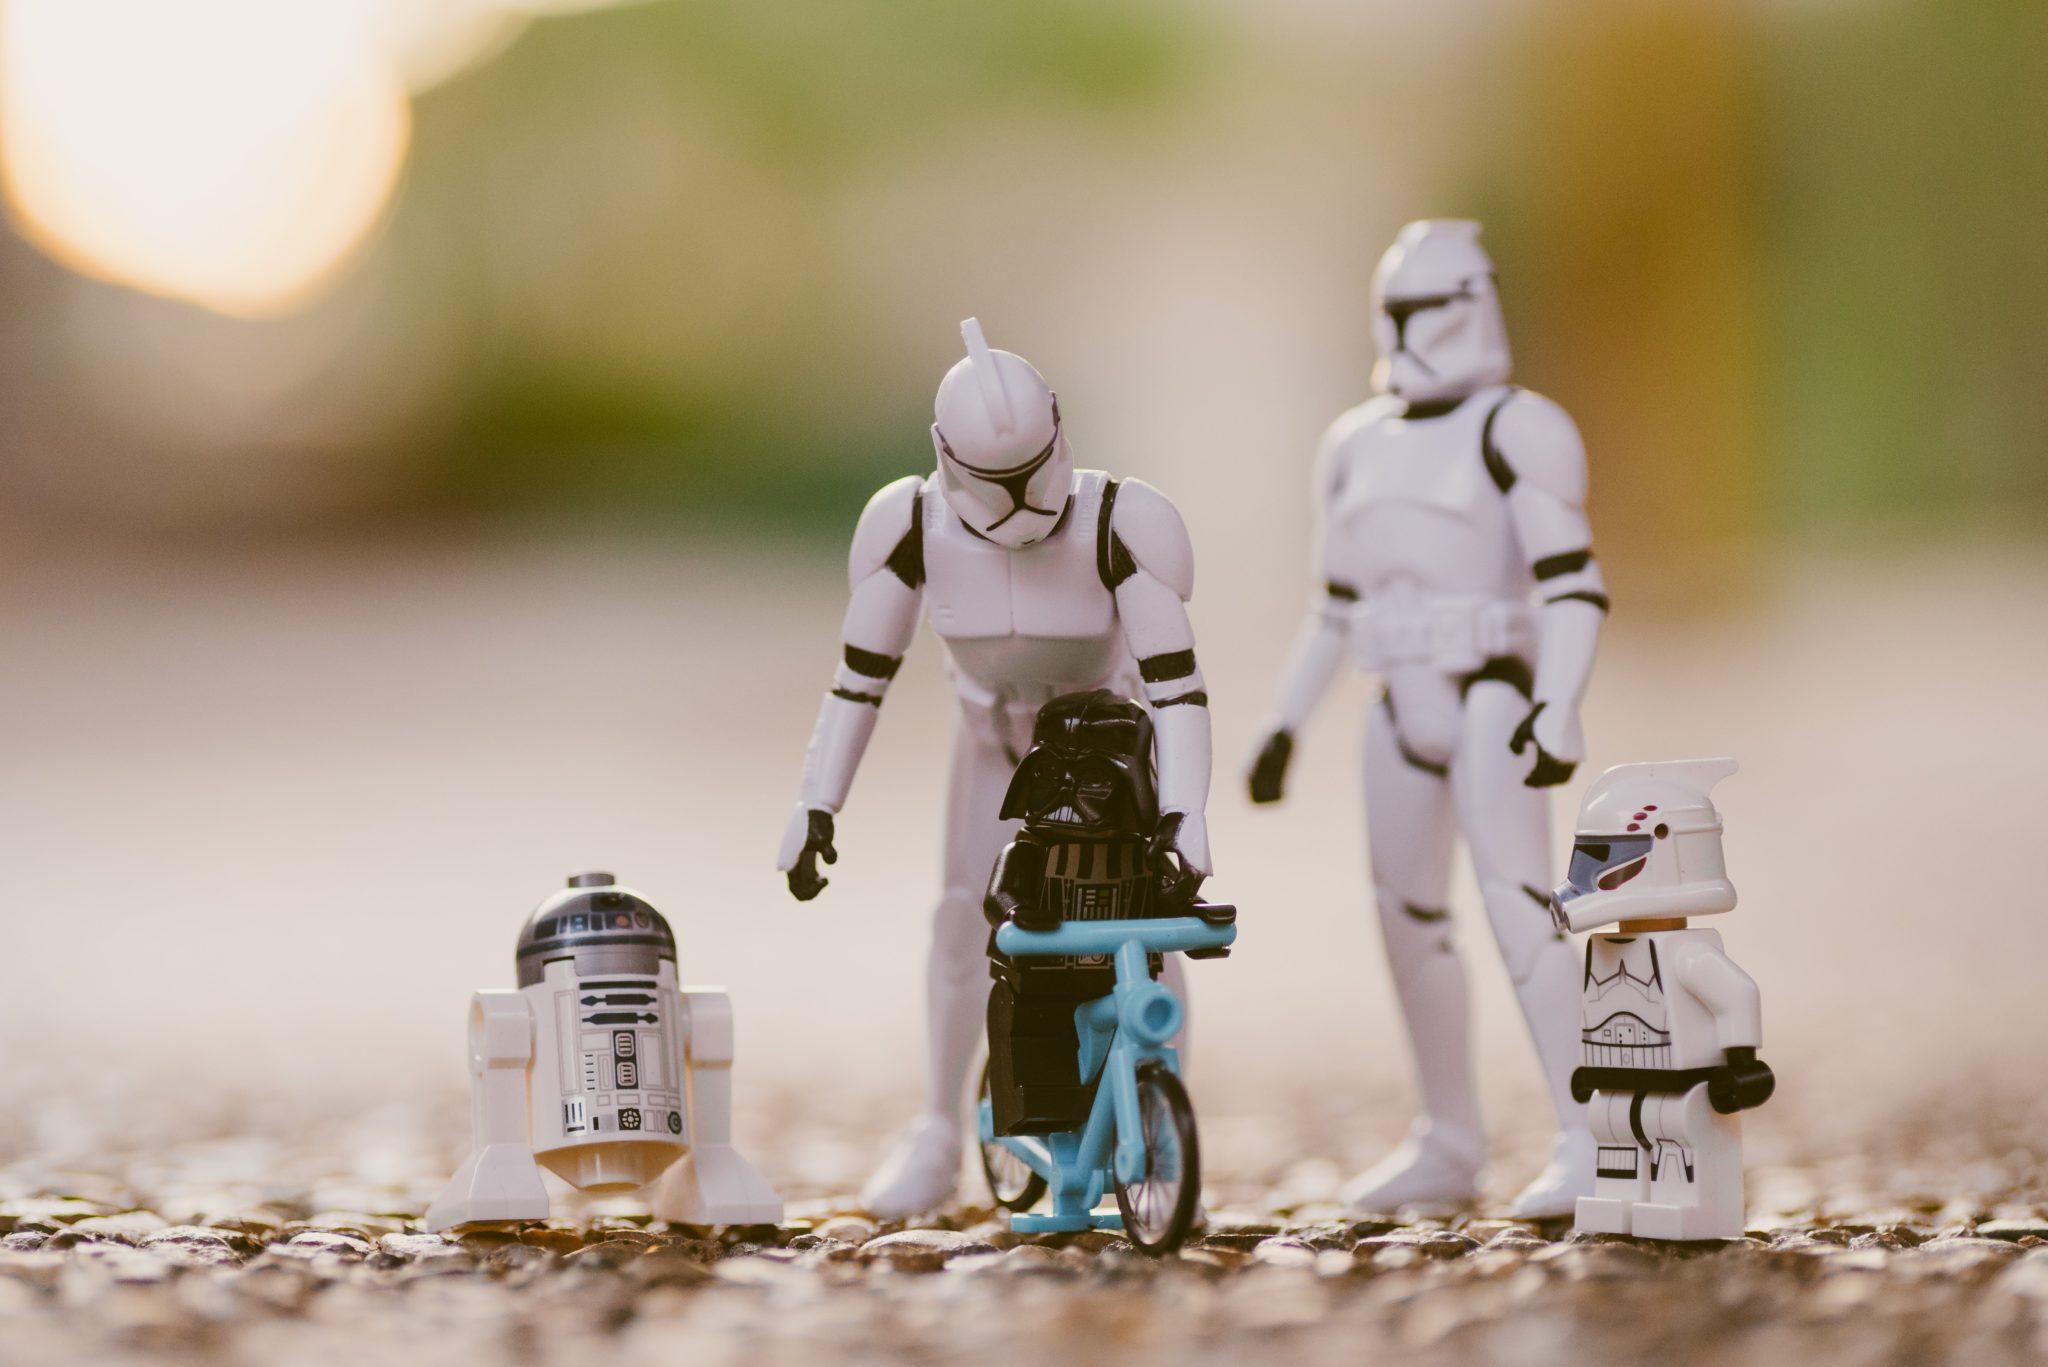 Famille star wars storm trooper